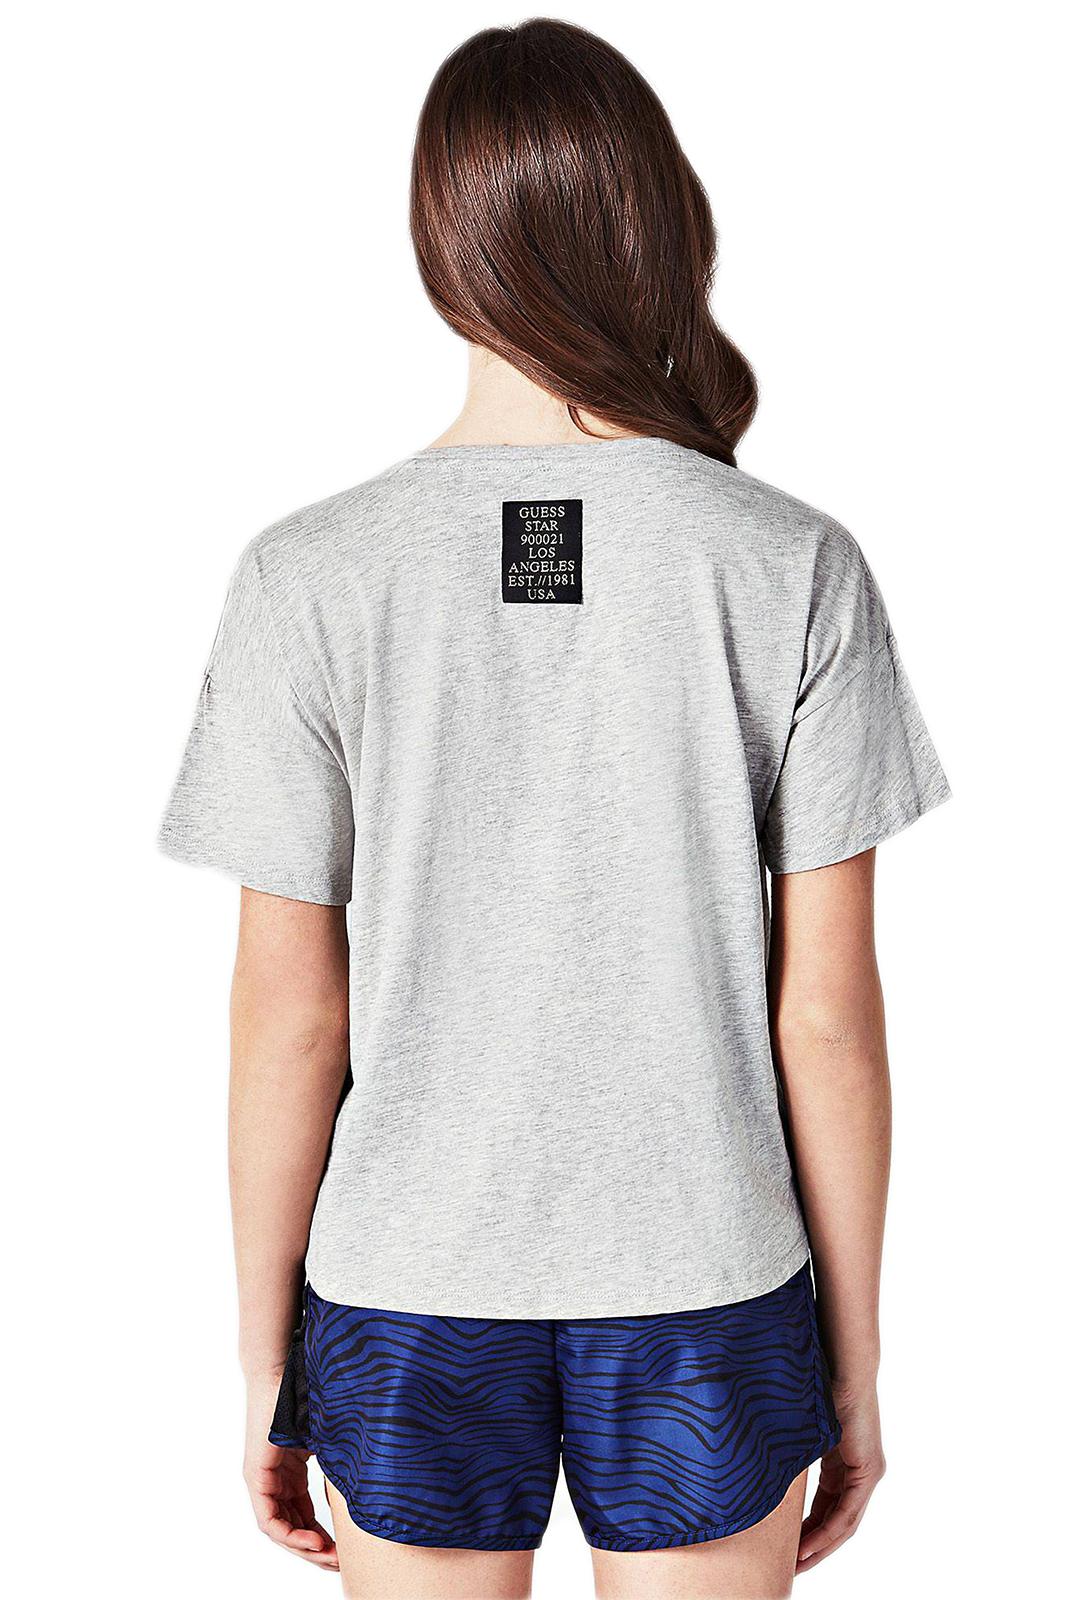 Tee shirt  Guess jeans O84A36 I3Z00 M90 Light Heather Grey